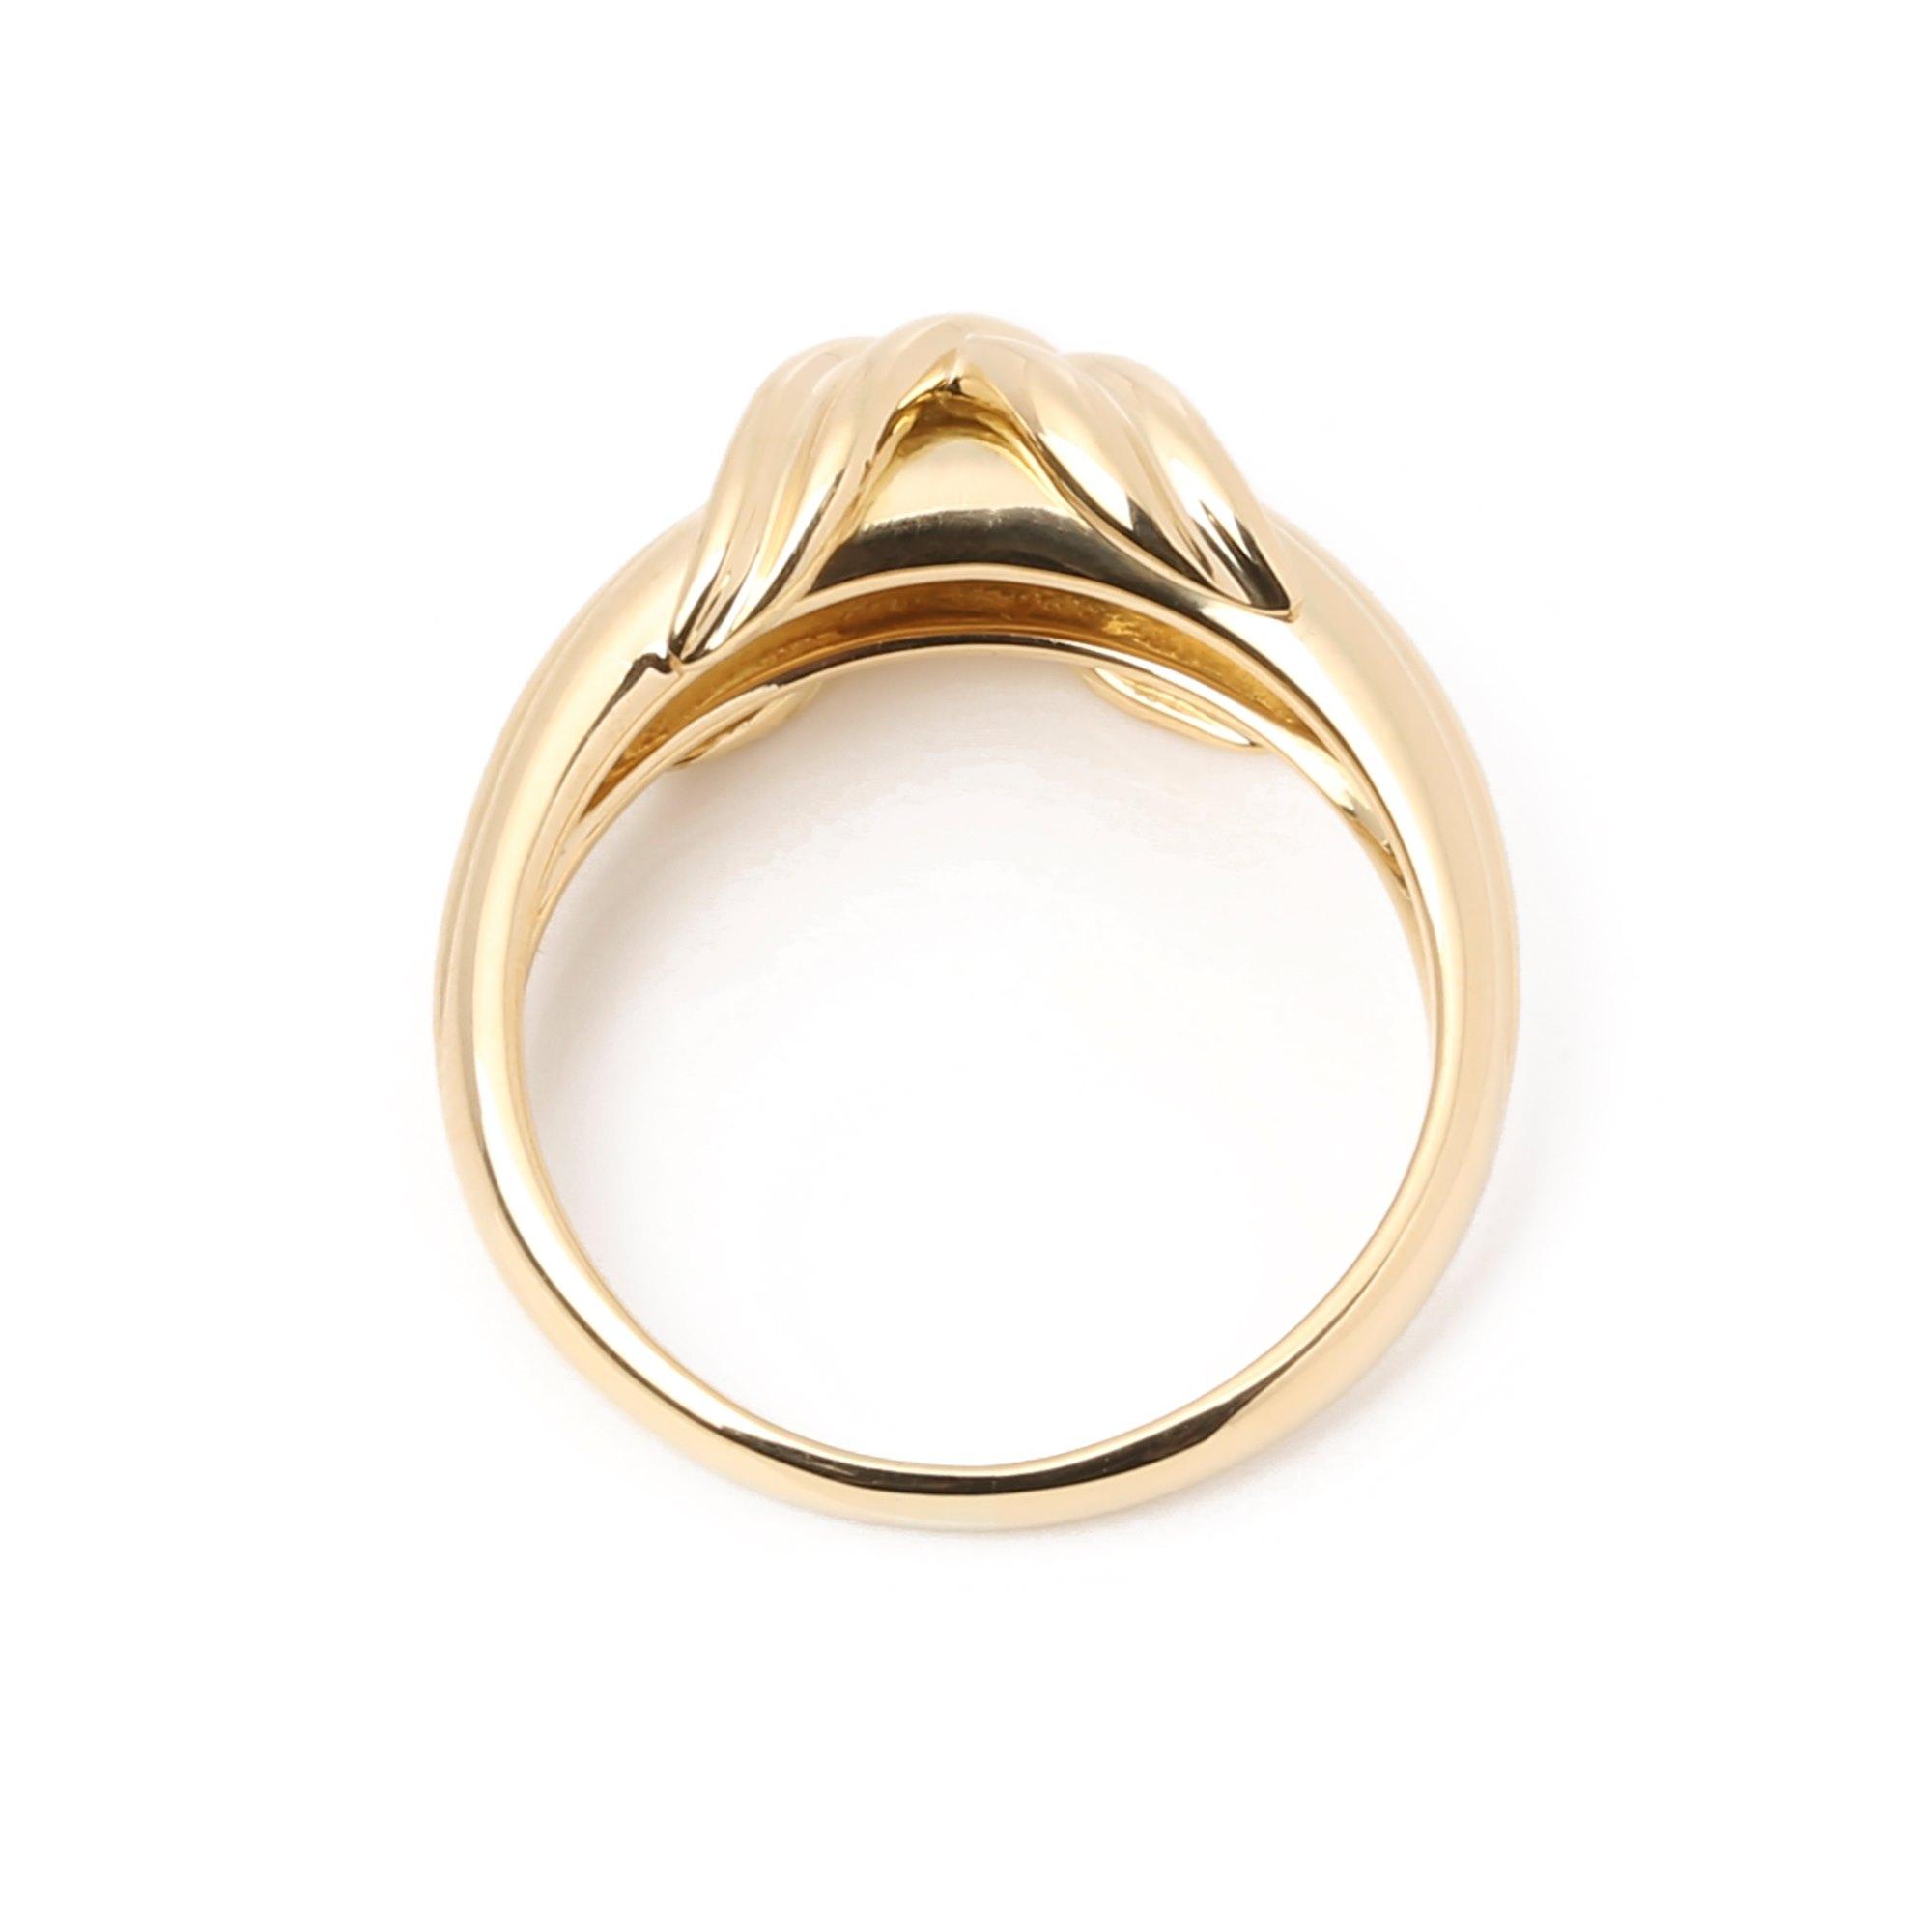 Tiffany & Co. Signature X Kiss Ring